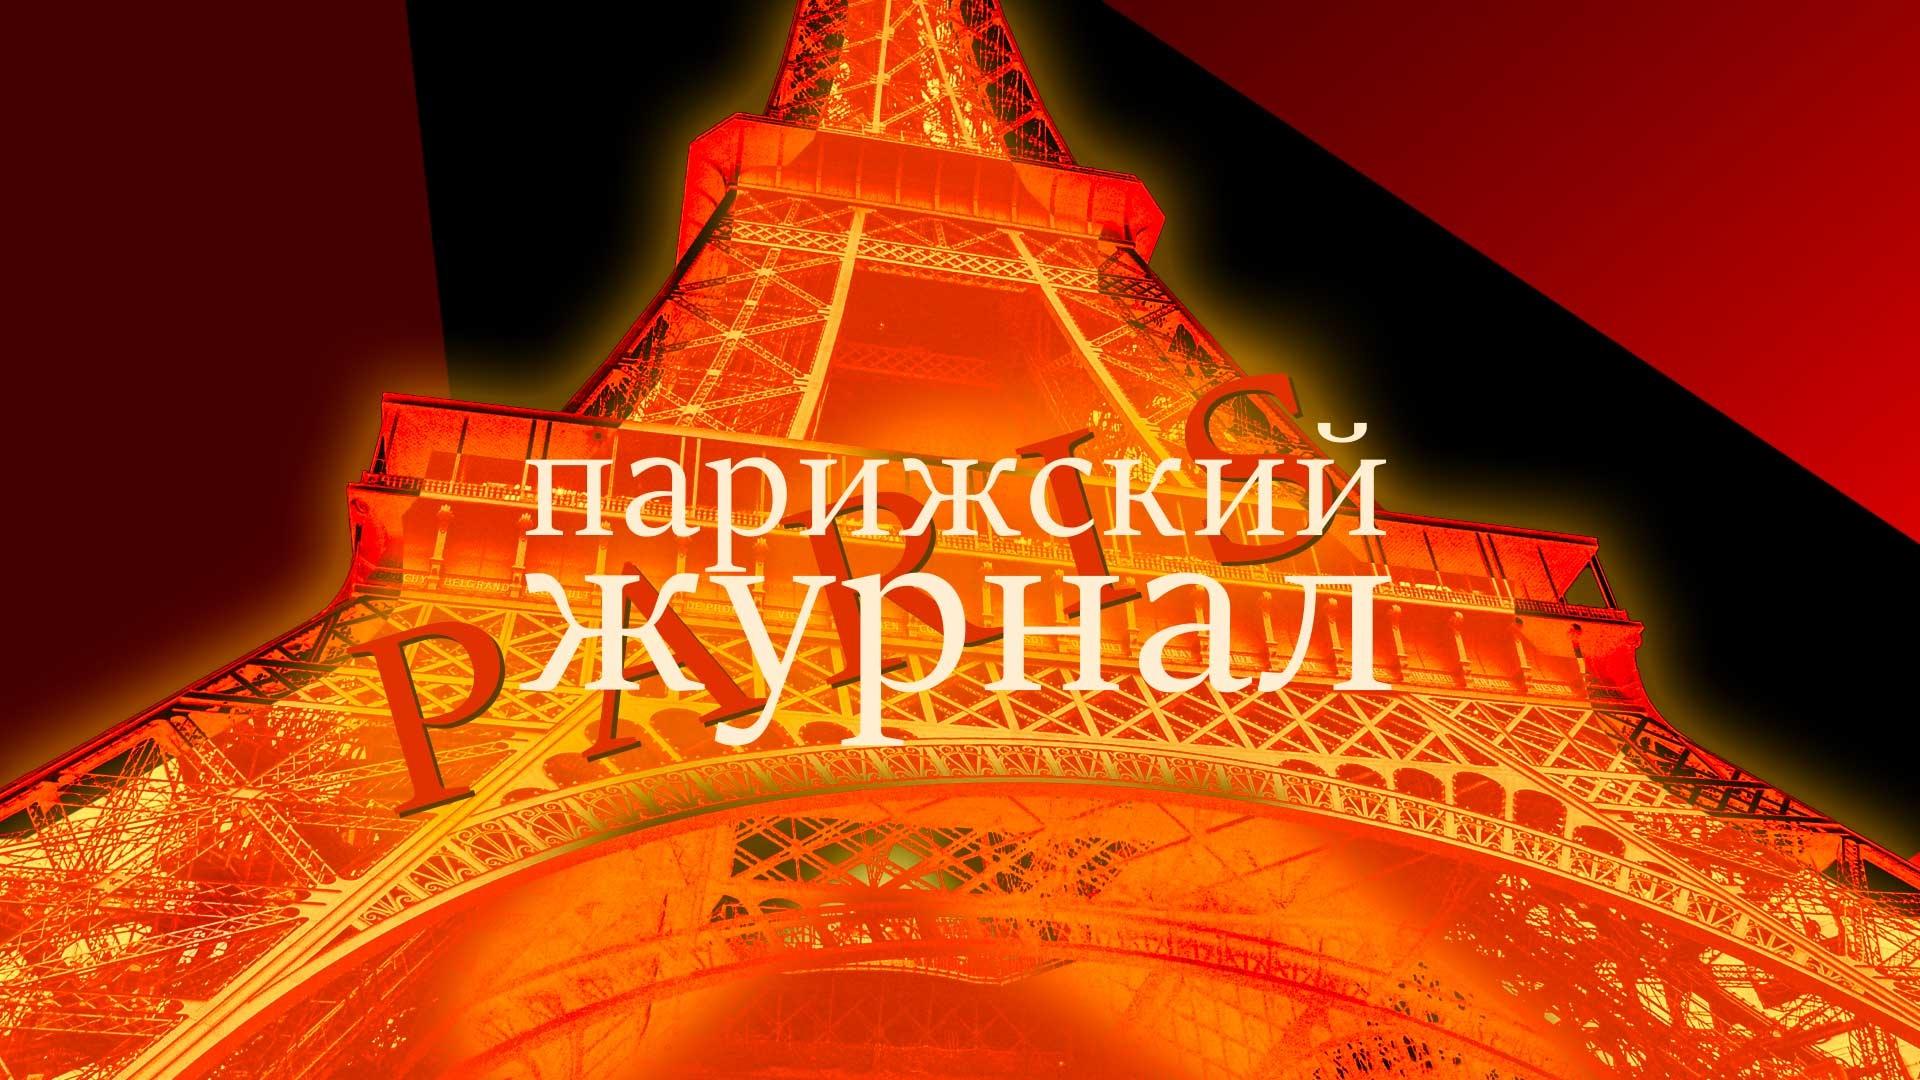 Парижский журнал